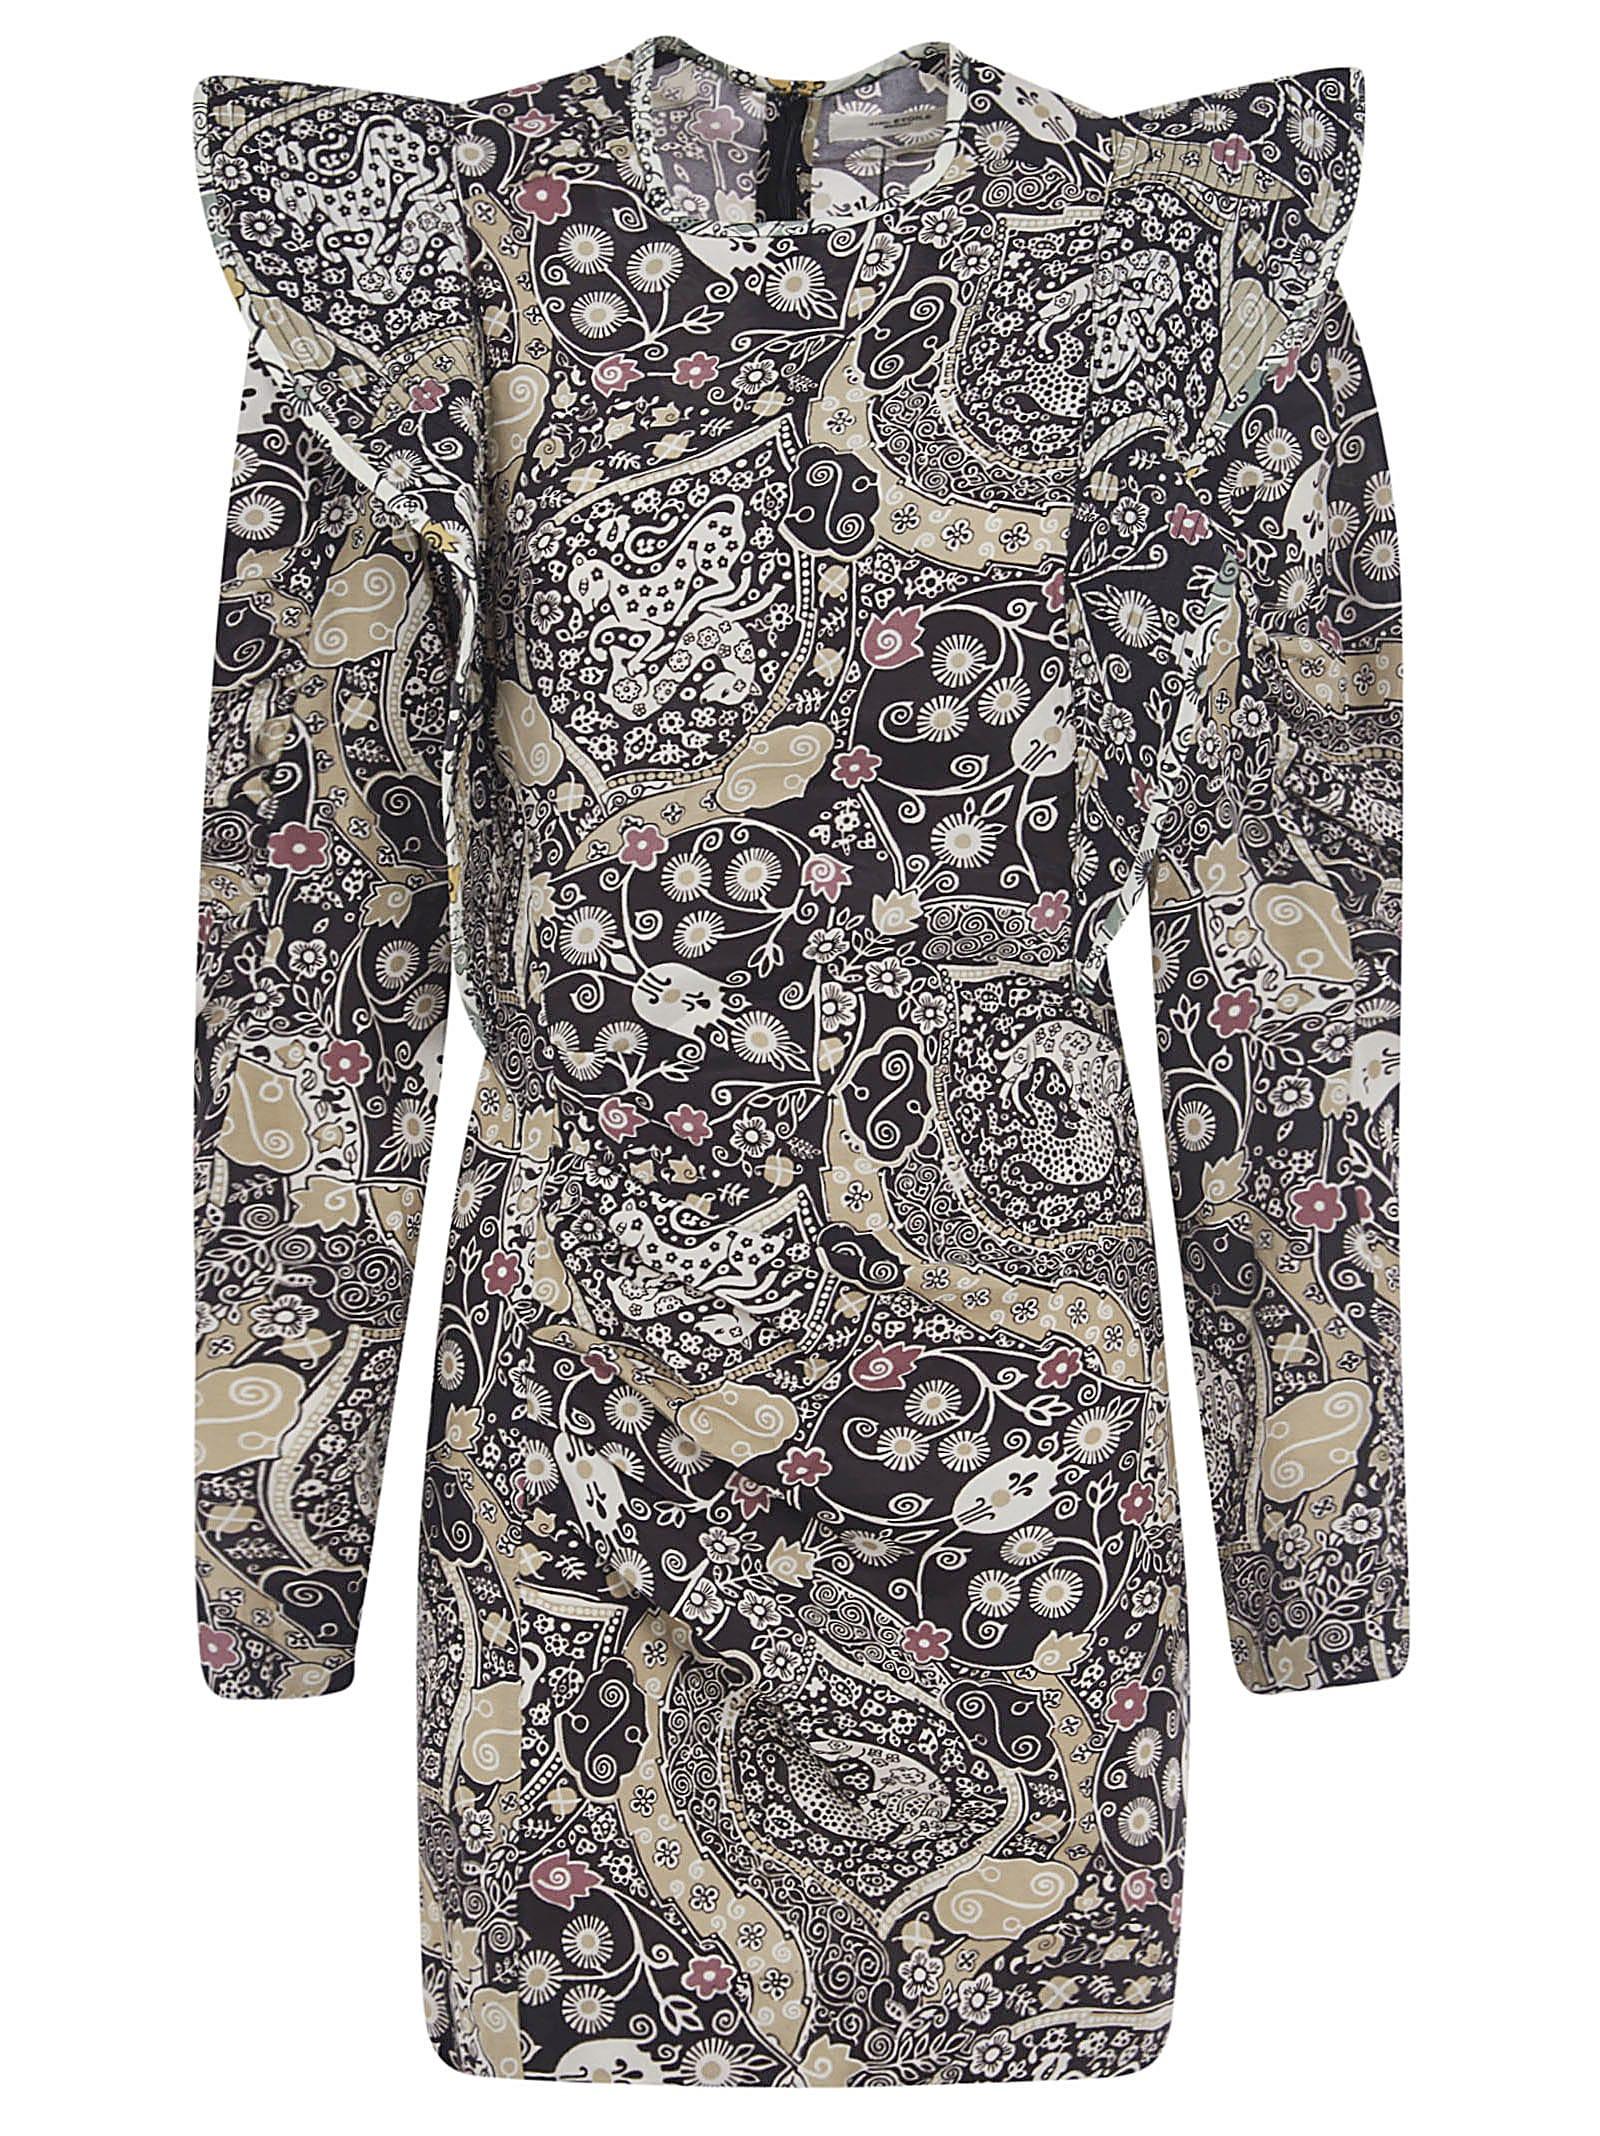 Buy Isabel Marant Étoile Multi-print Short Dress online, shop Isabel Marant Étoile with free shipping